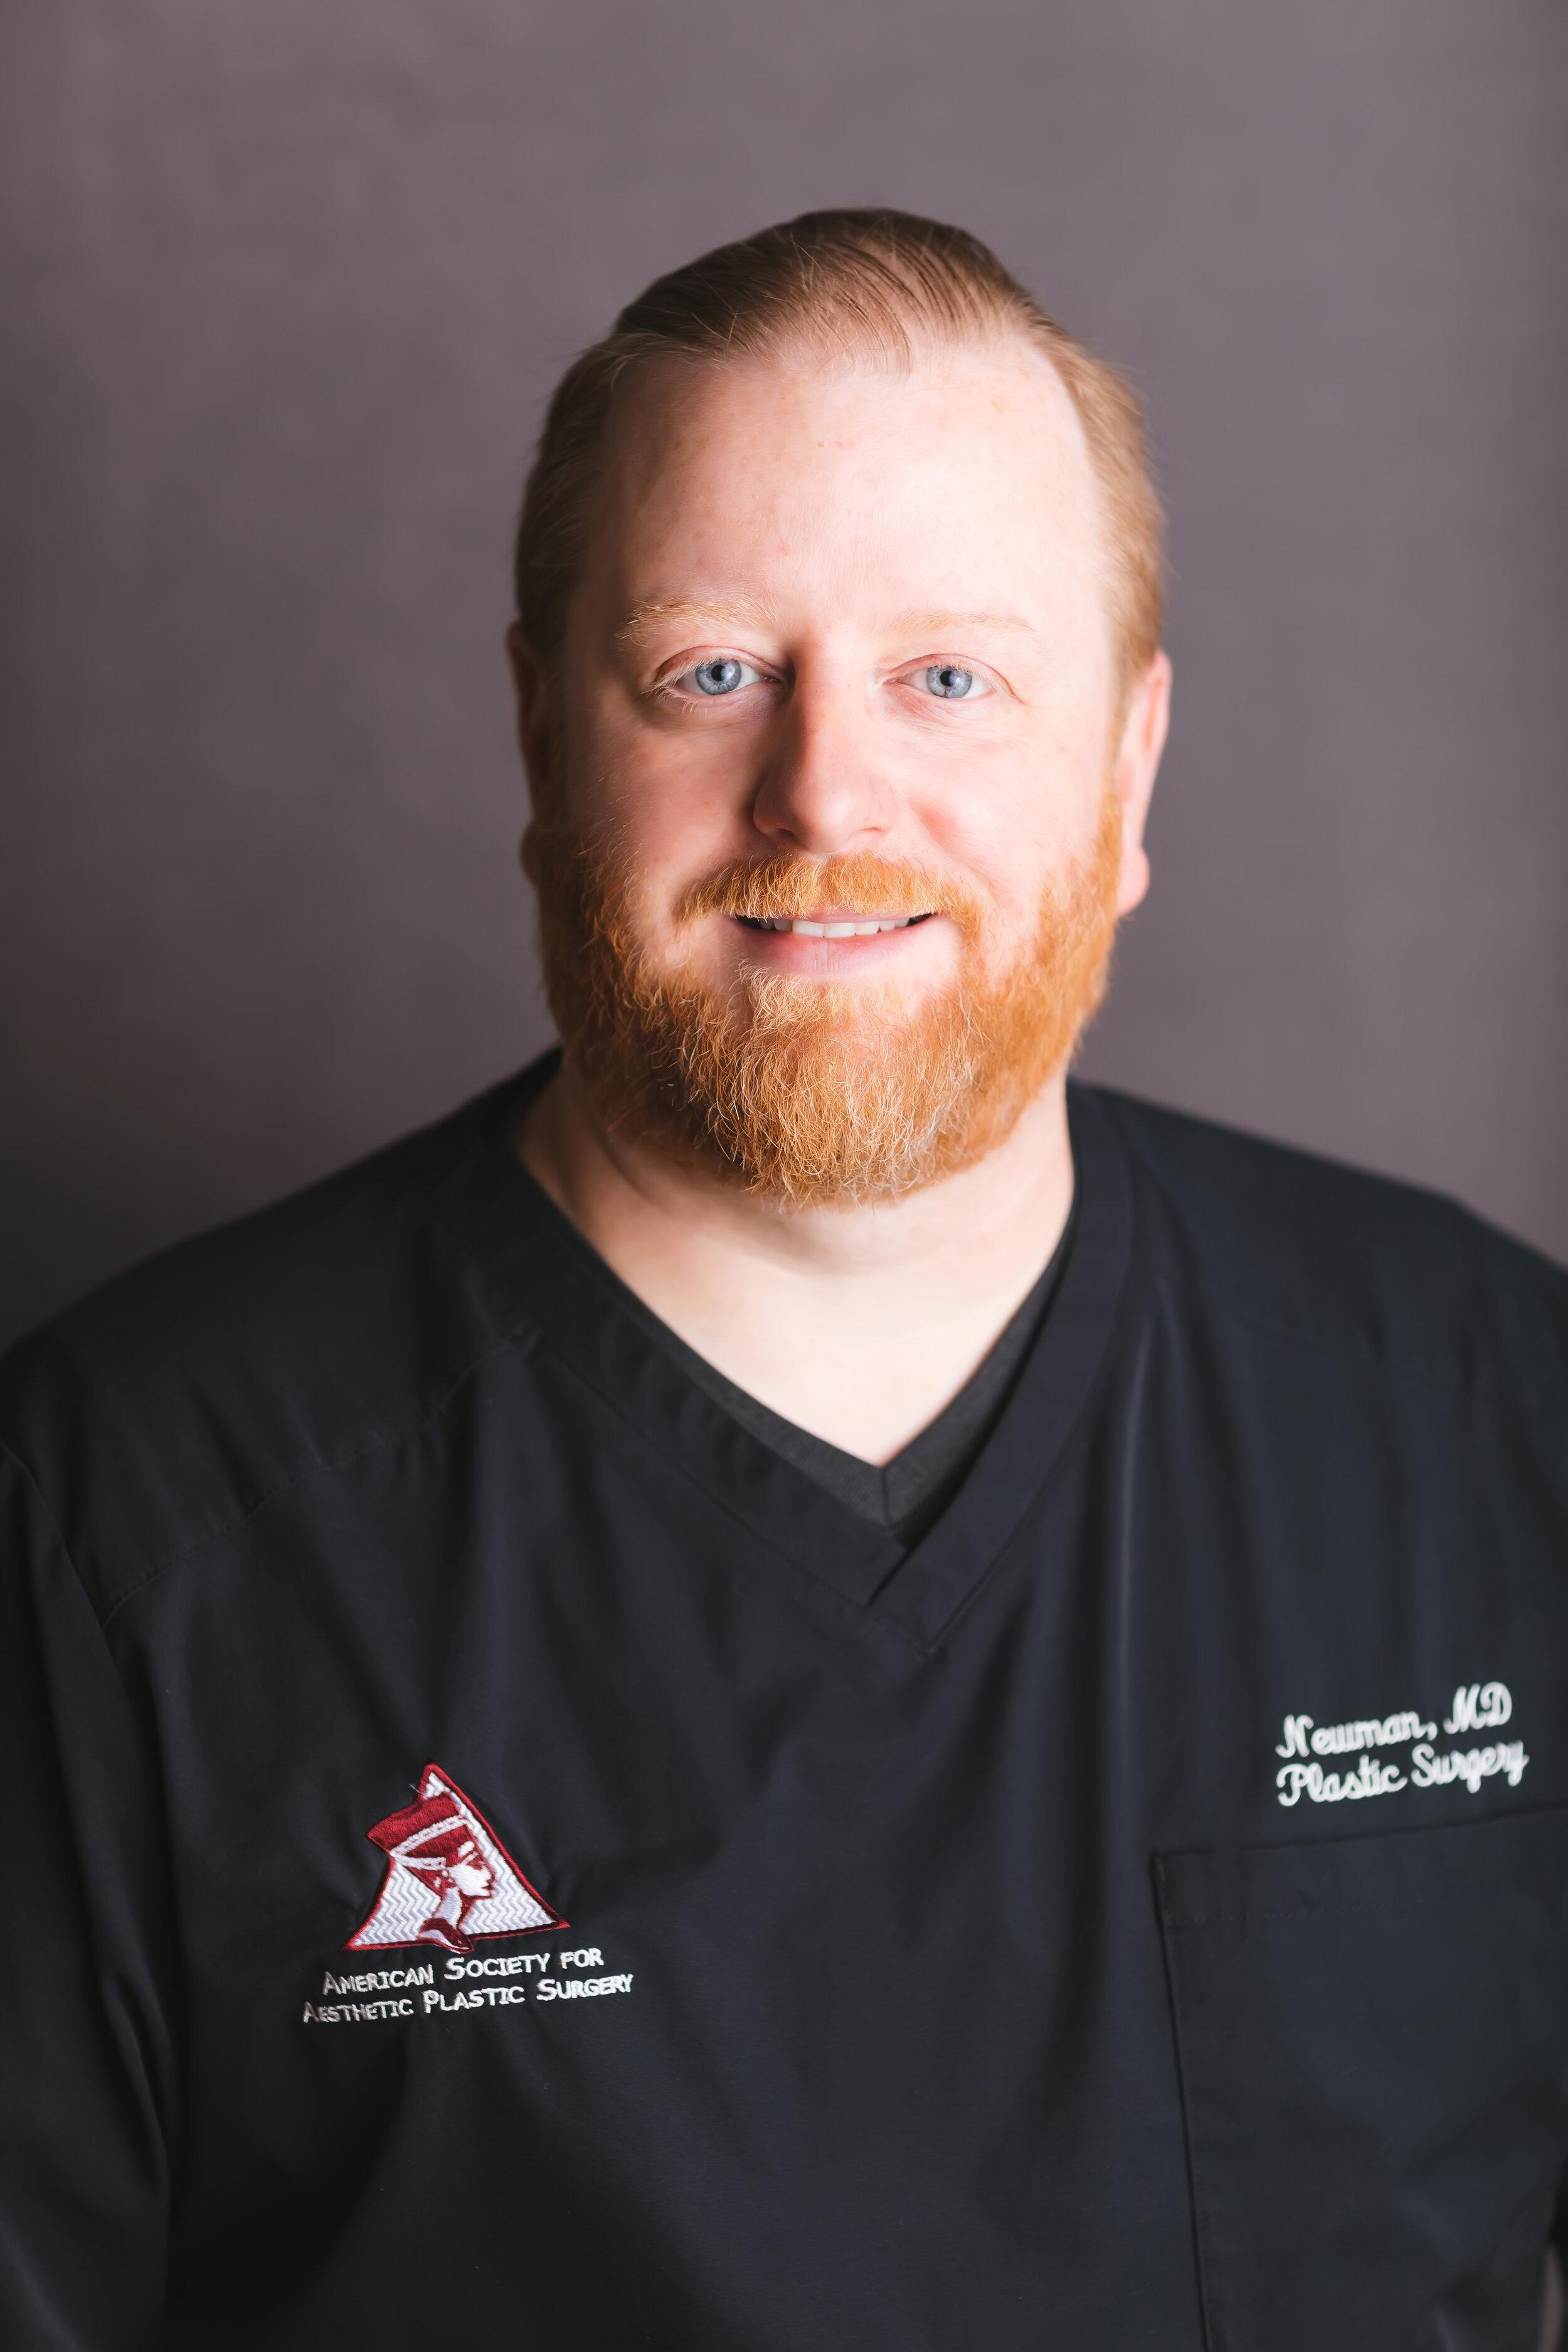 Adam G. Newman, MD   Board Certified Plastic Surgeon